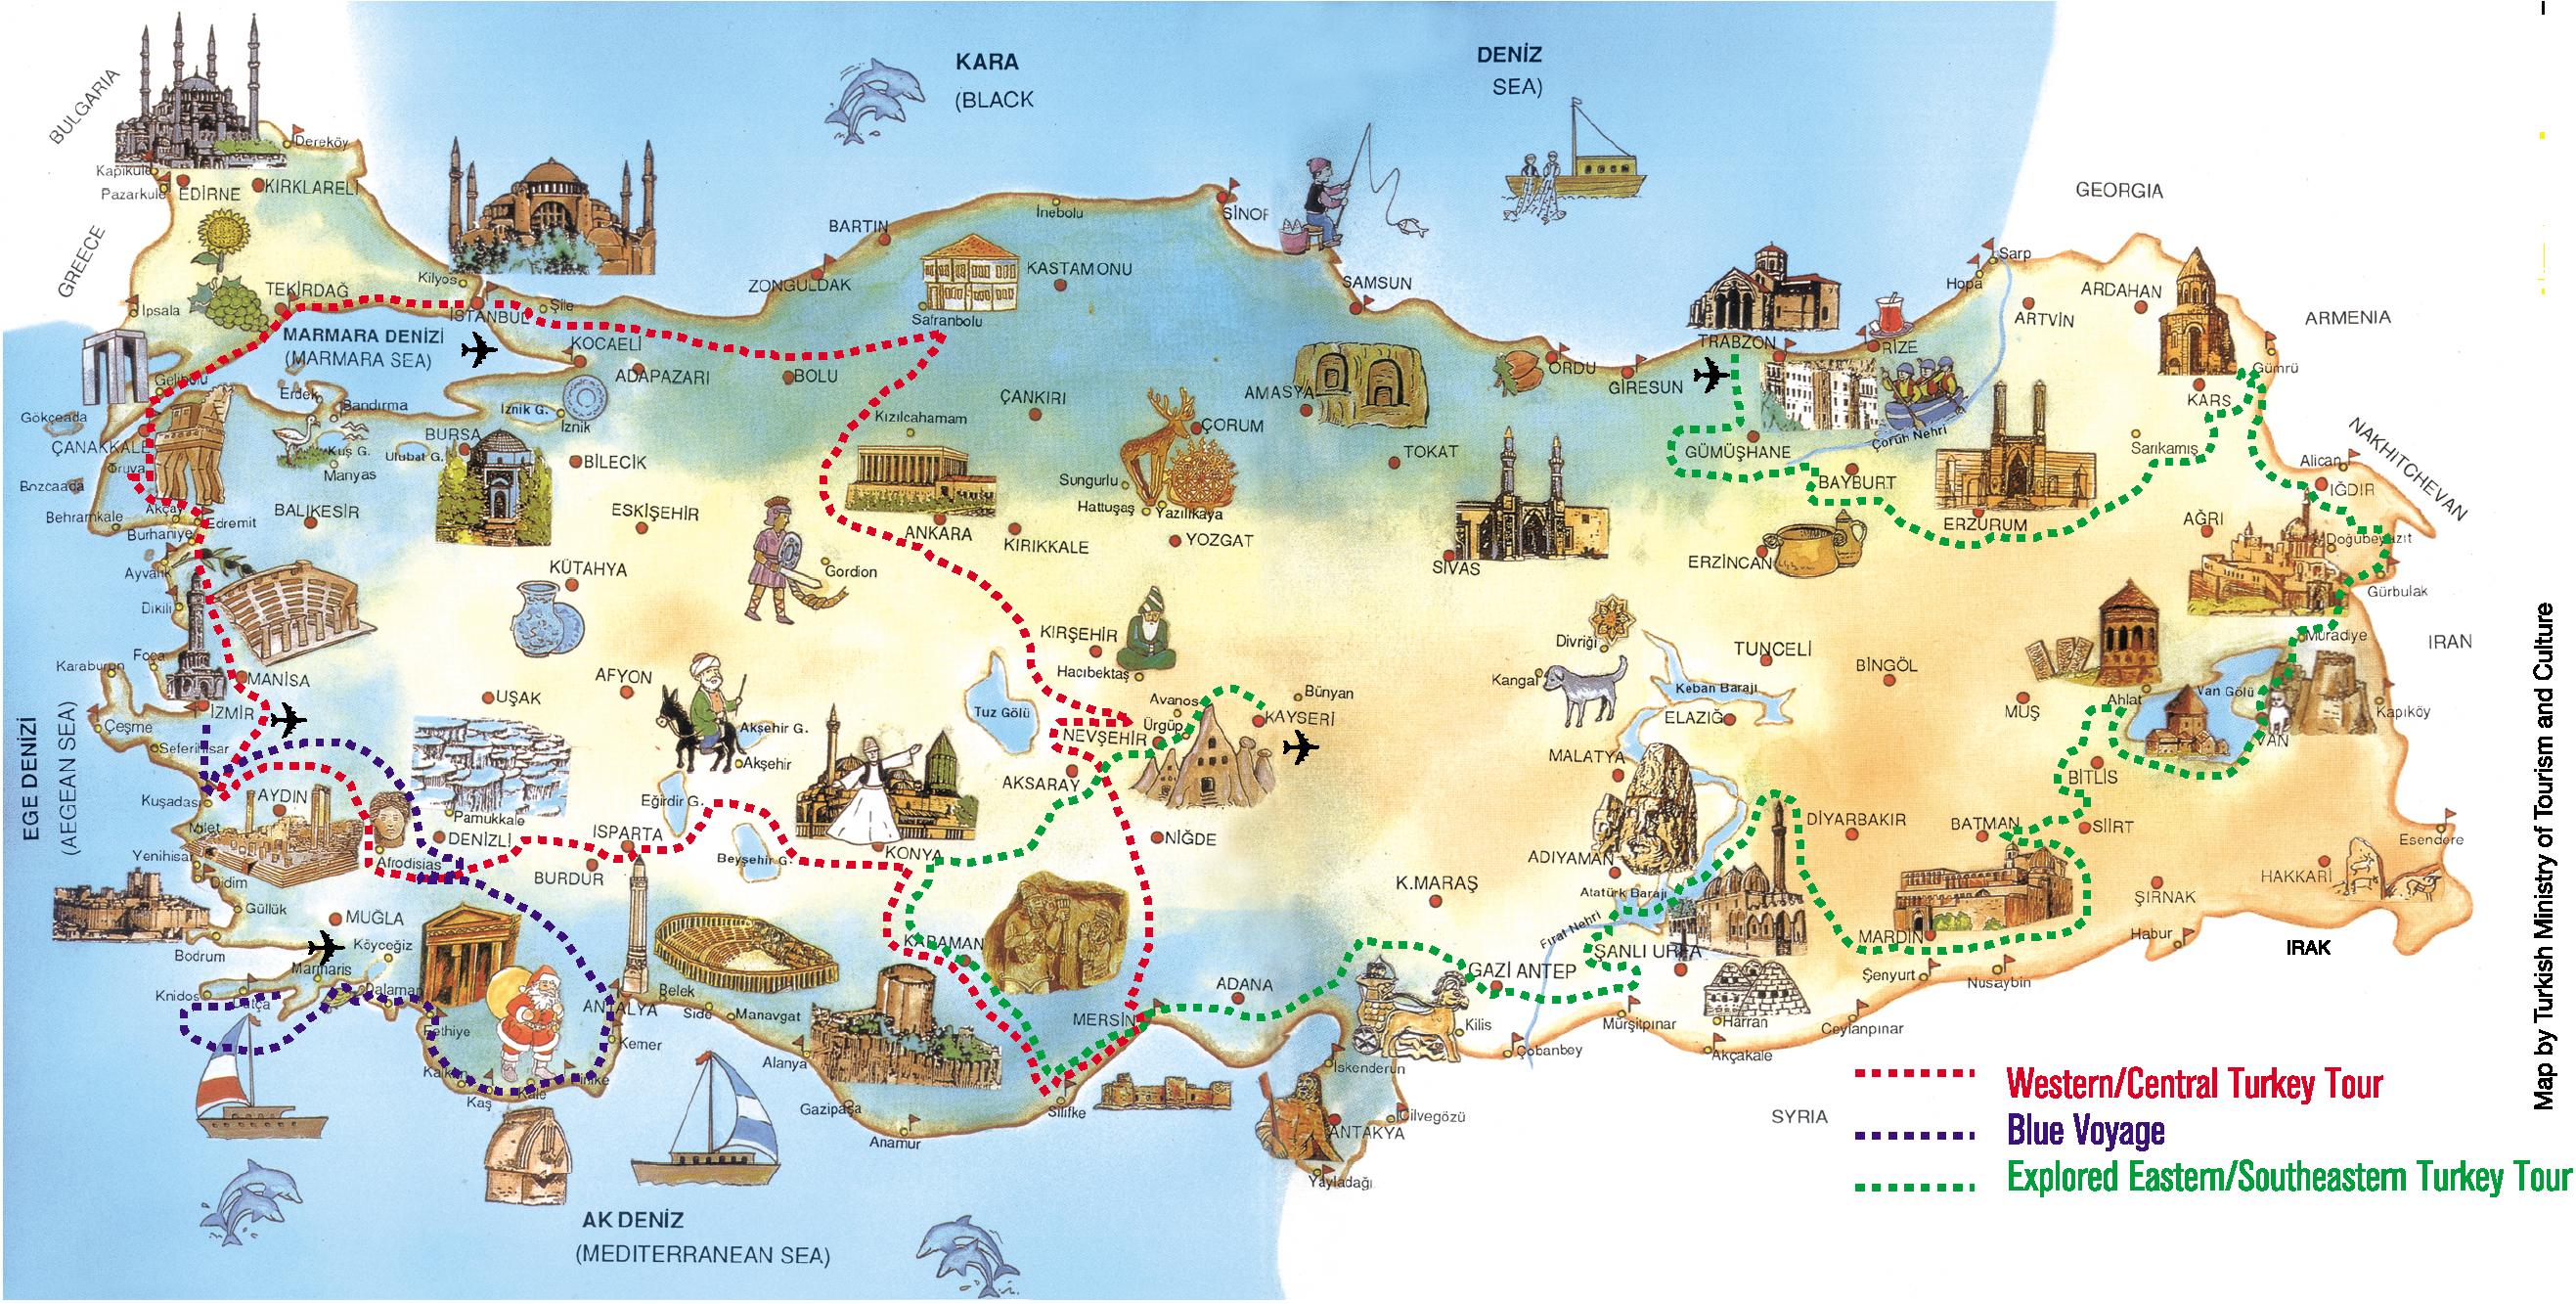 Turkey maps Free Wallpaper WallpaperJamcom